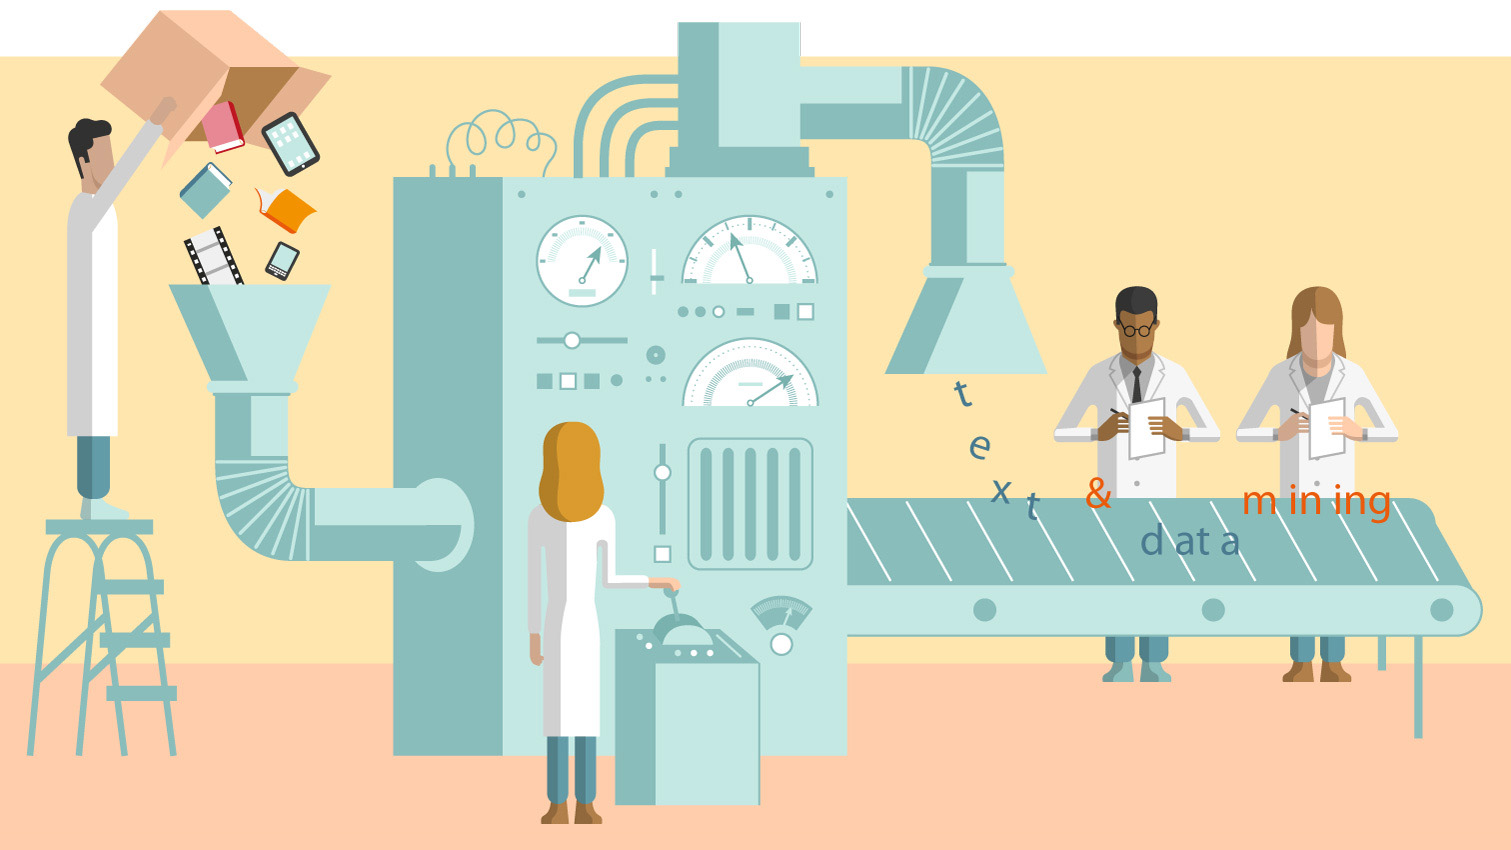 Text and Data Mining - Illustration by Davide Bonazzi